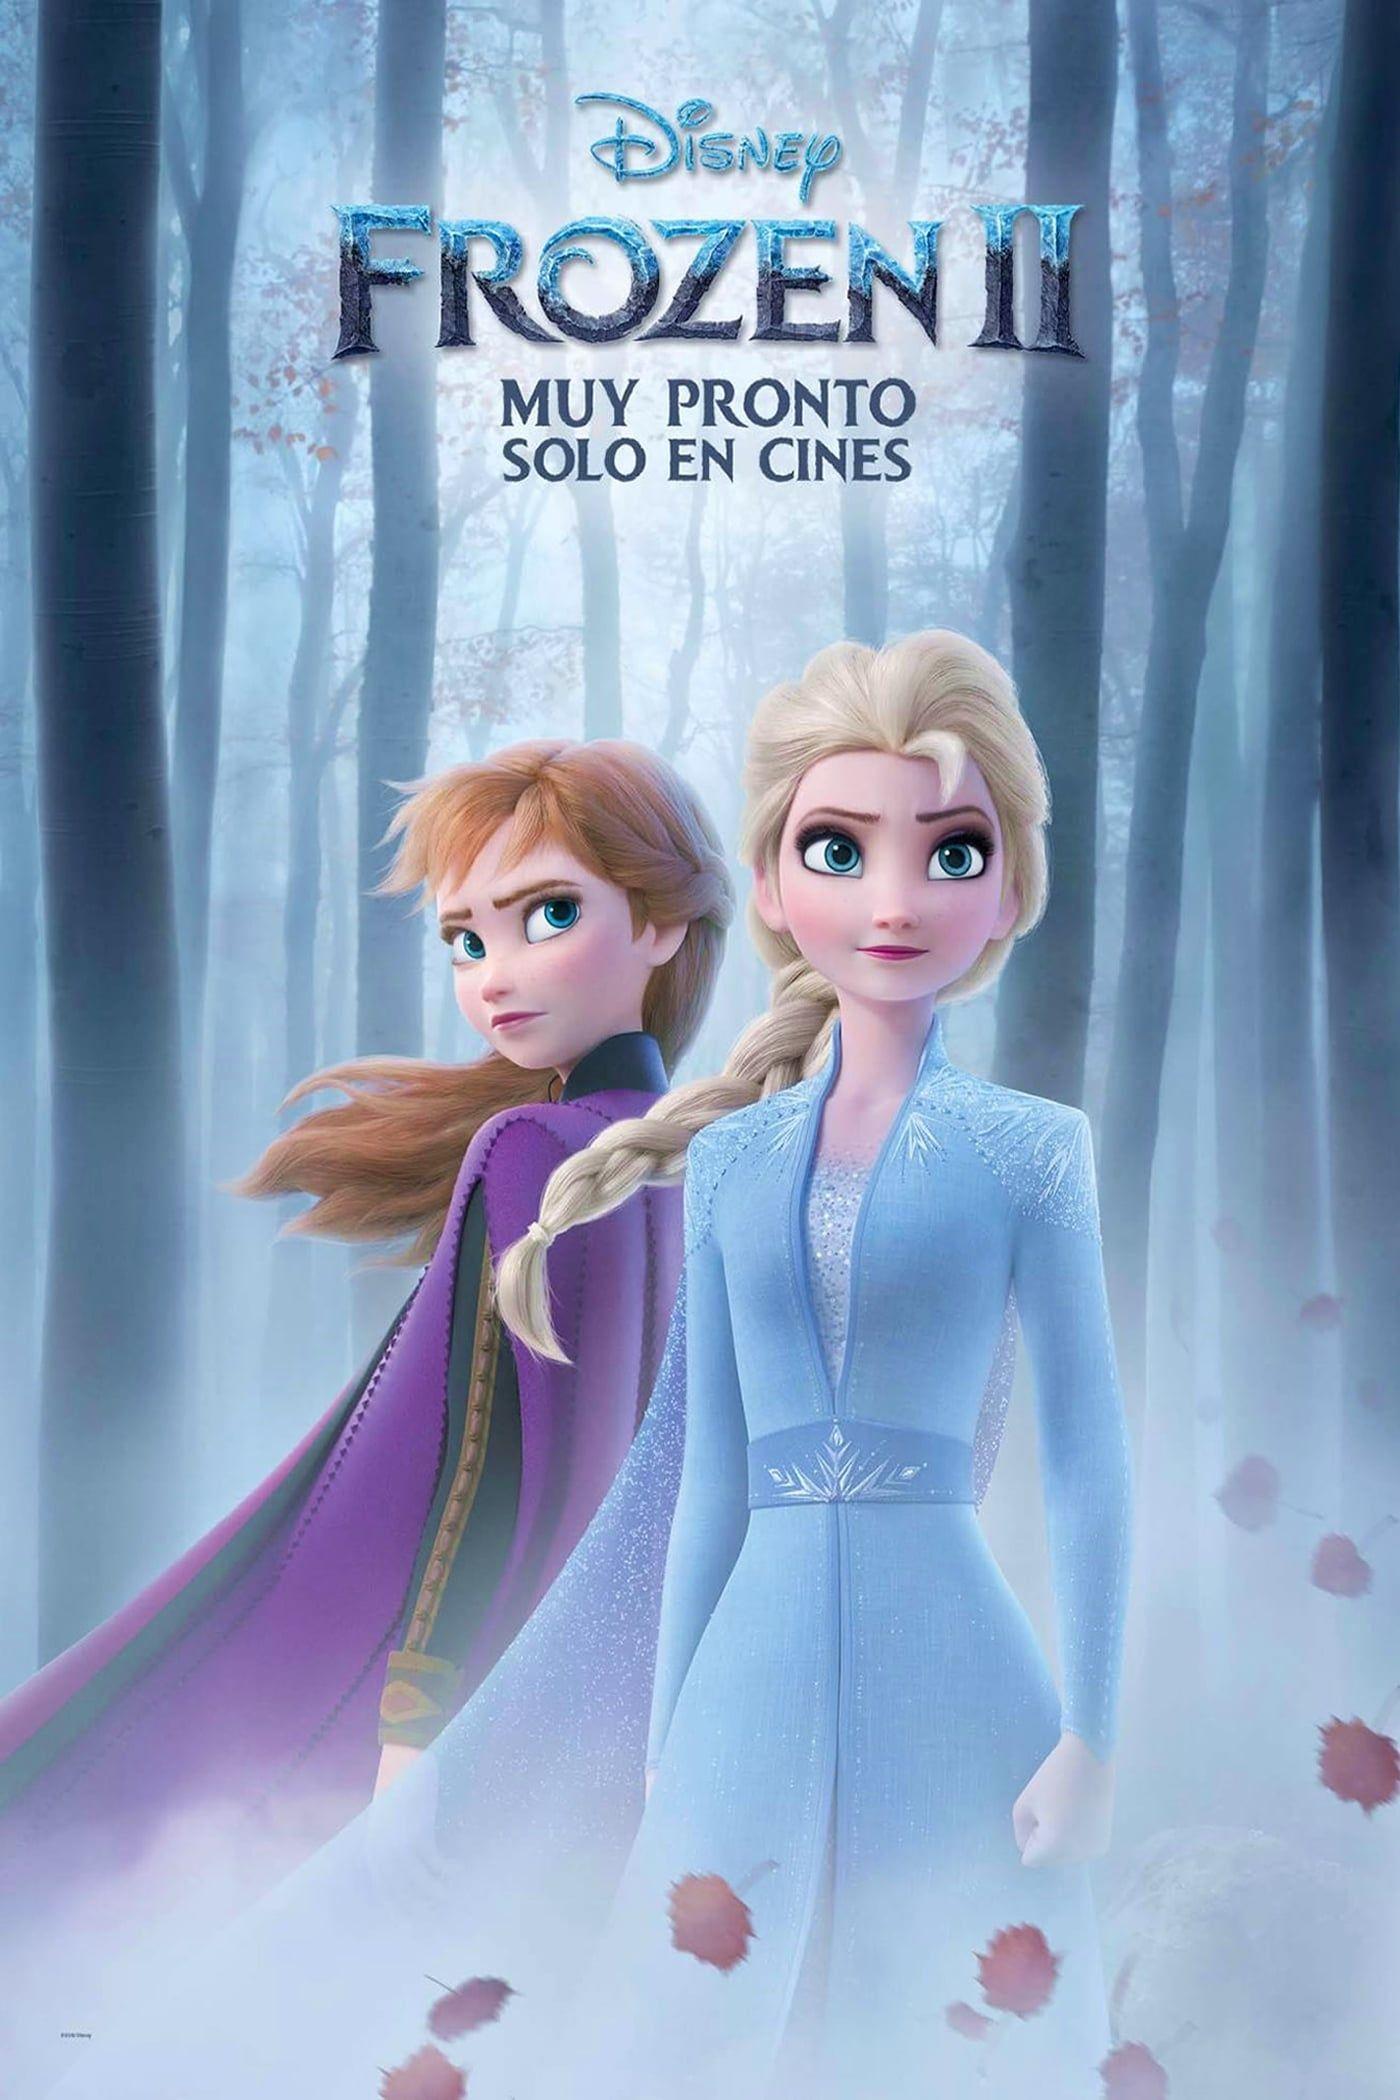 Ver Frozen 2 2019 Online Latino Gratis Ultrapeliculashd